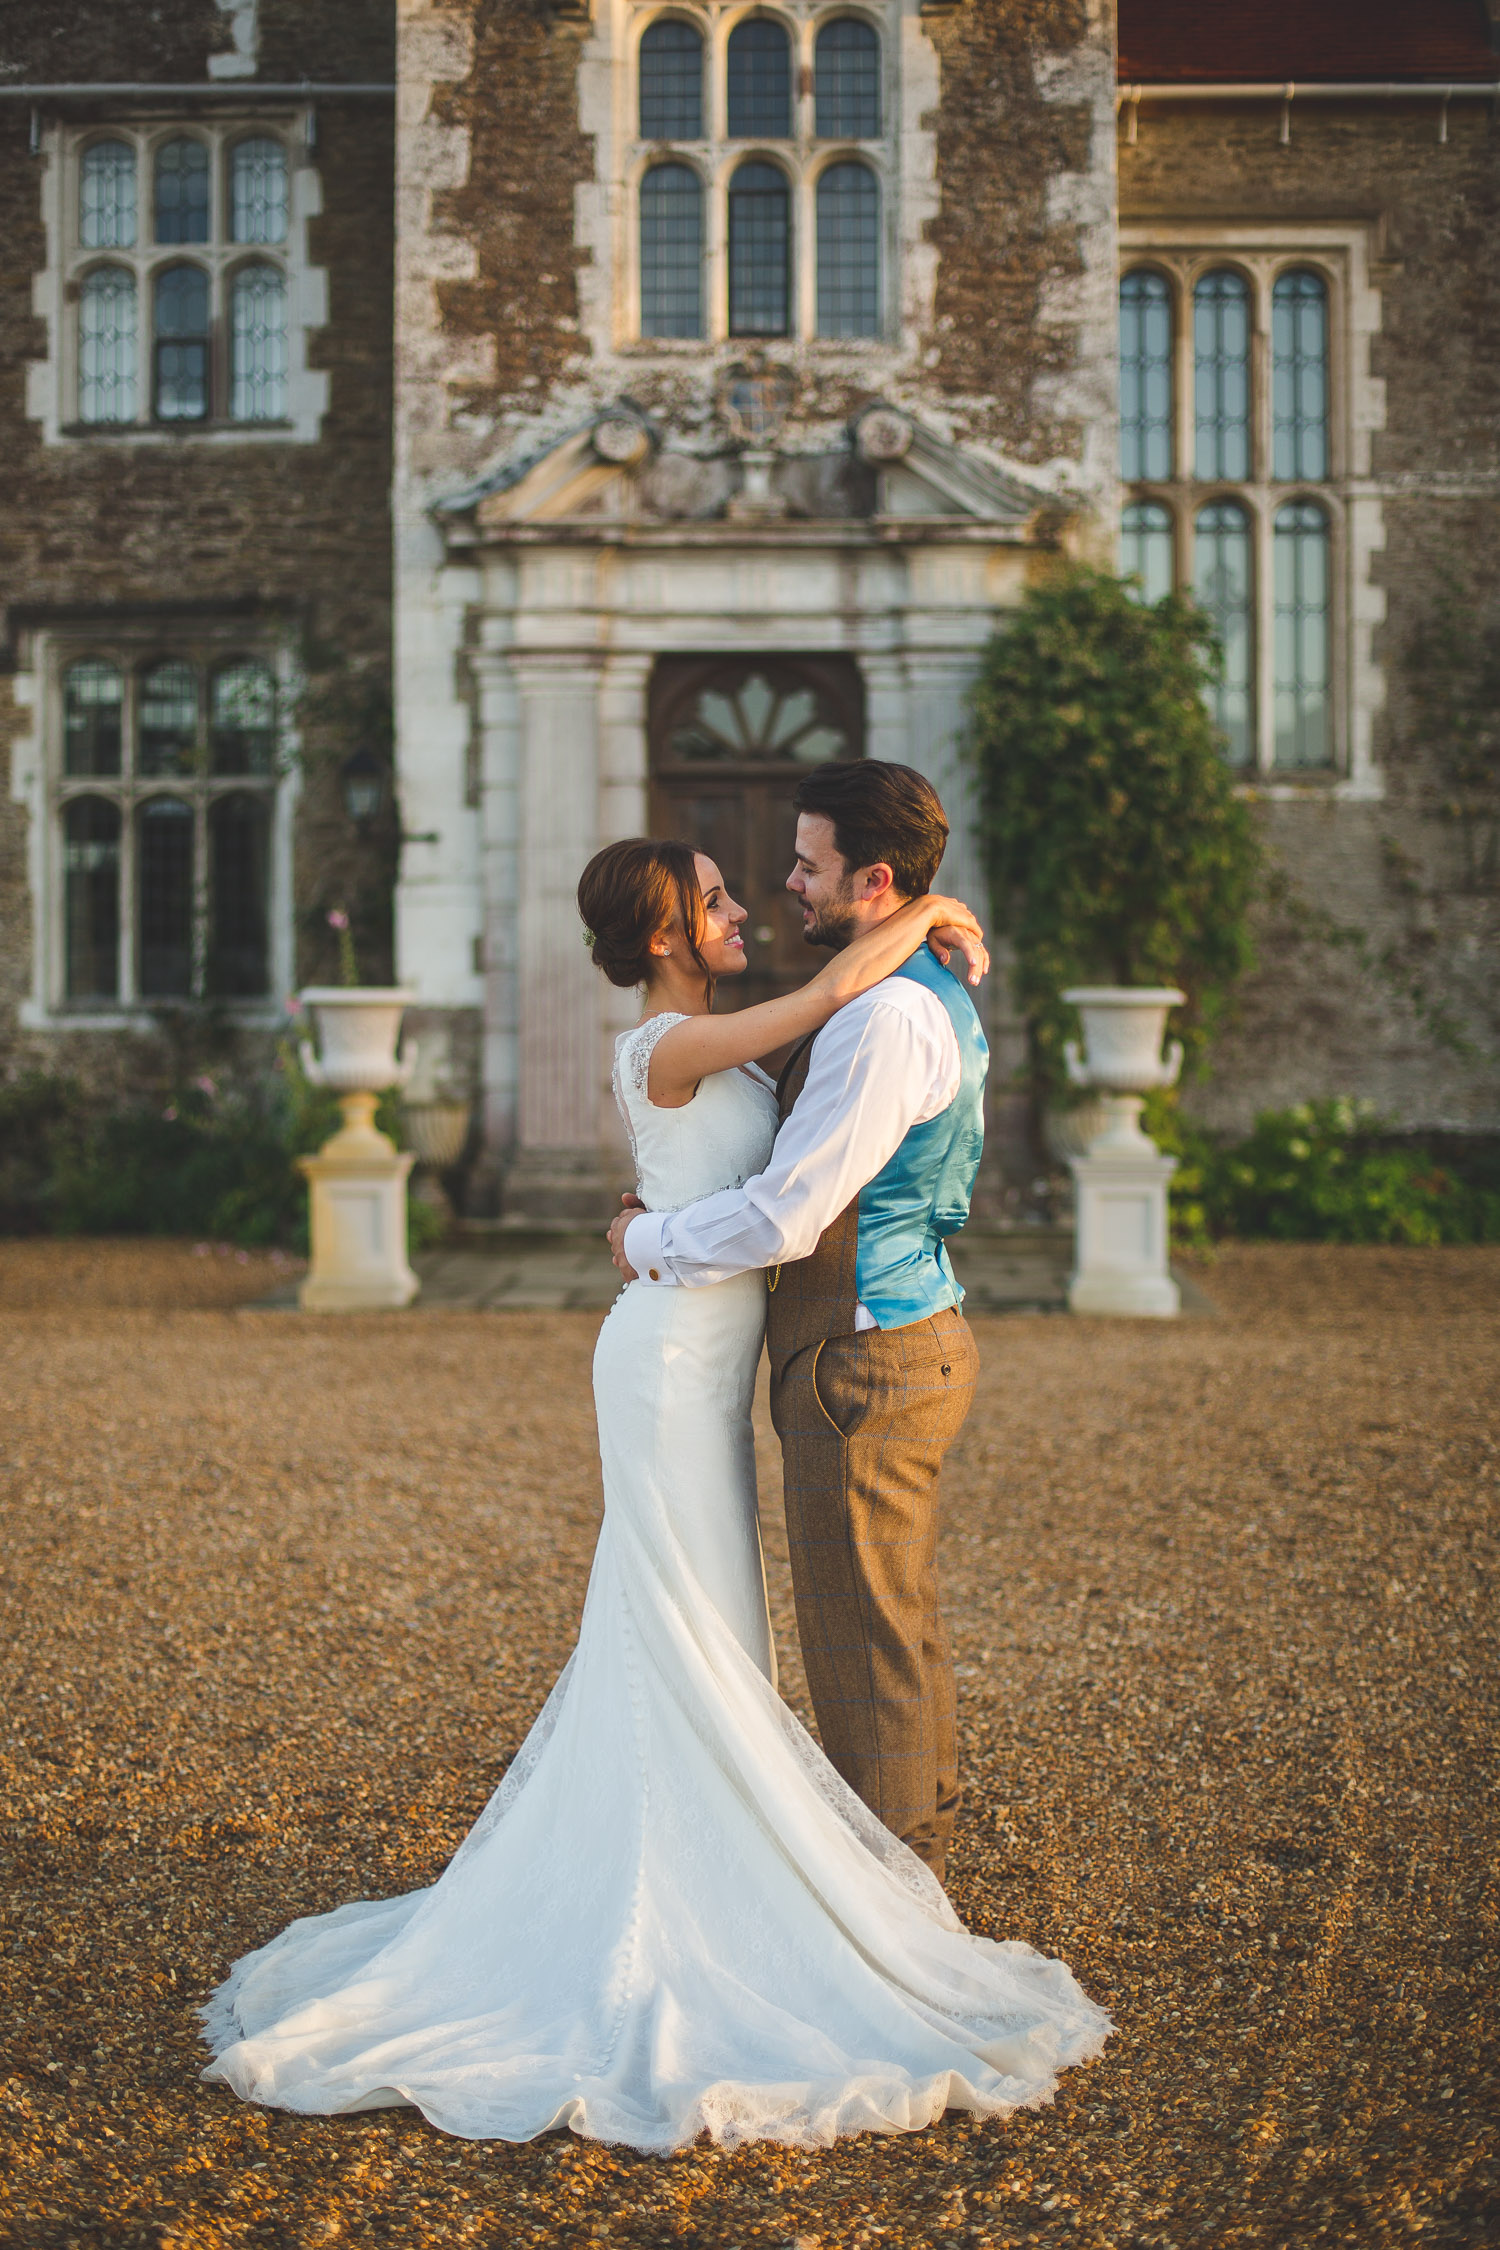 Surrey Wedding Photographer Jake Meg122.jpg